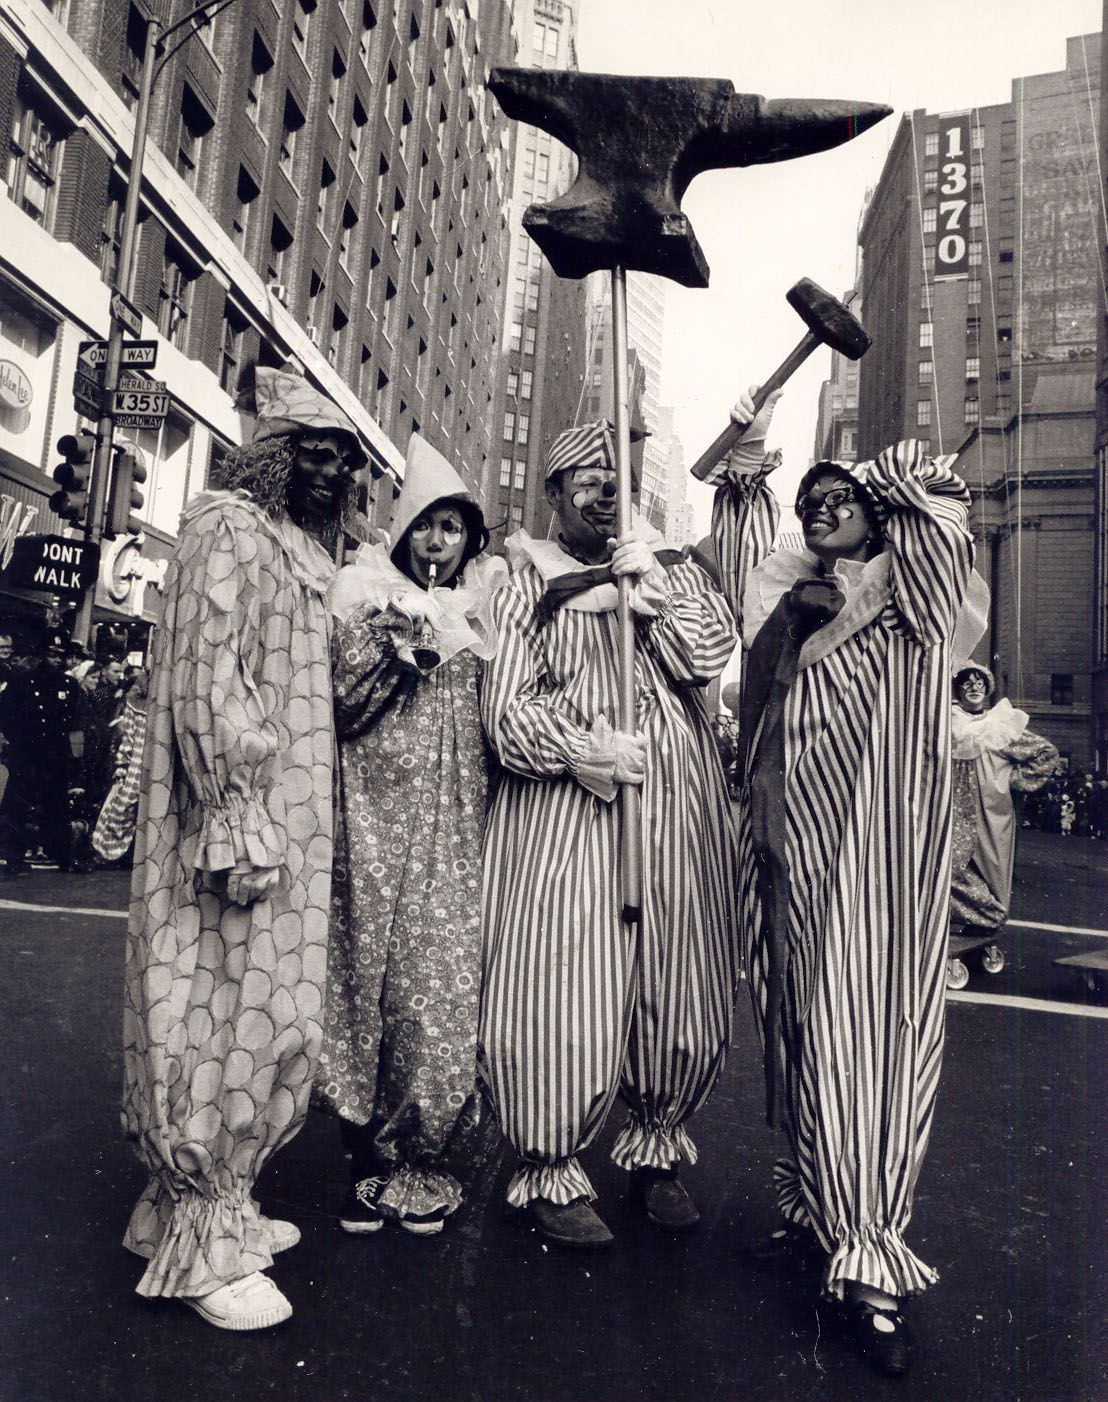 Macys Thanksgiving Day Parade Clowns 1966 Thanksgiving Day Parade Macys Thanksgiving Parade Macy S Day Parade